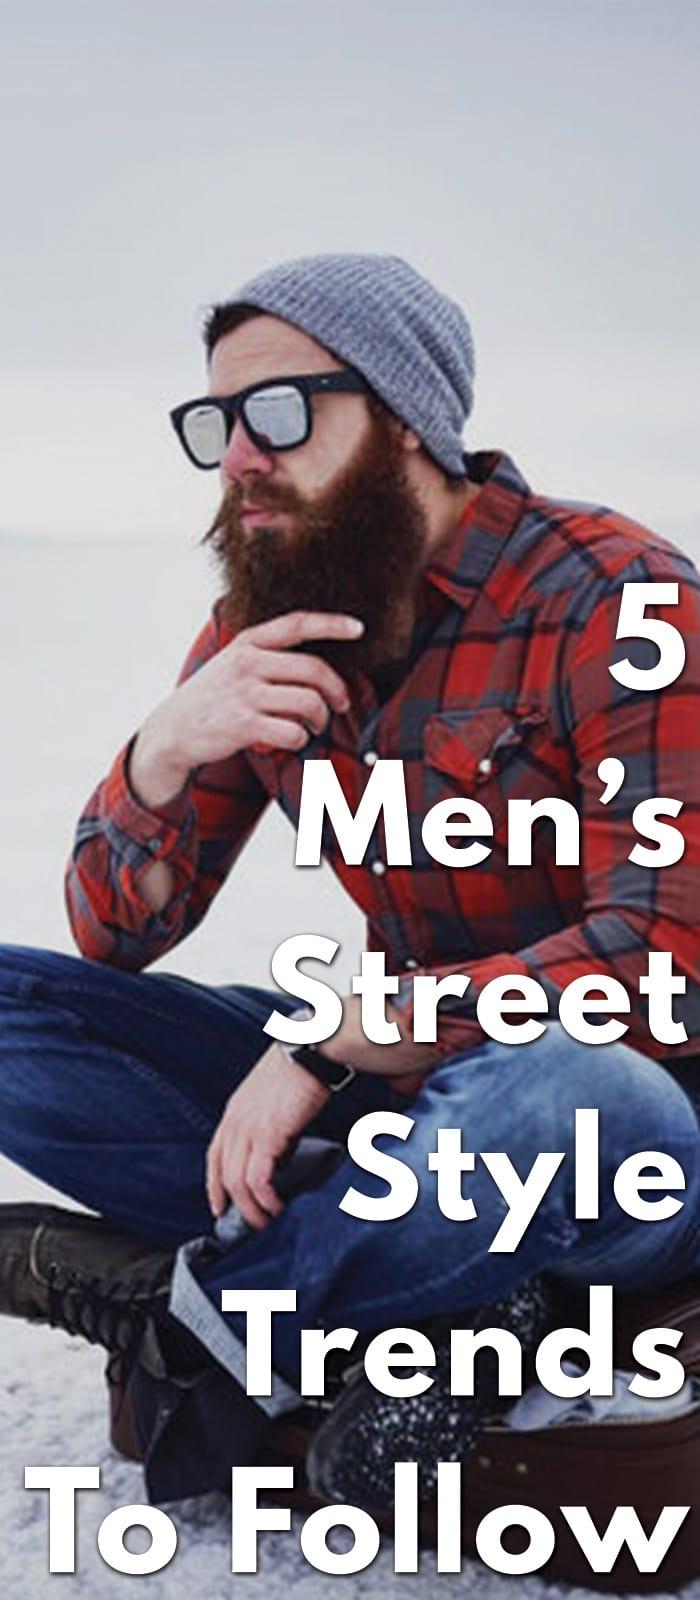 5 Men's Street Style Trends